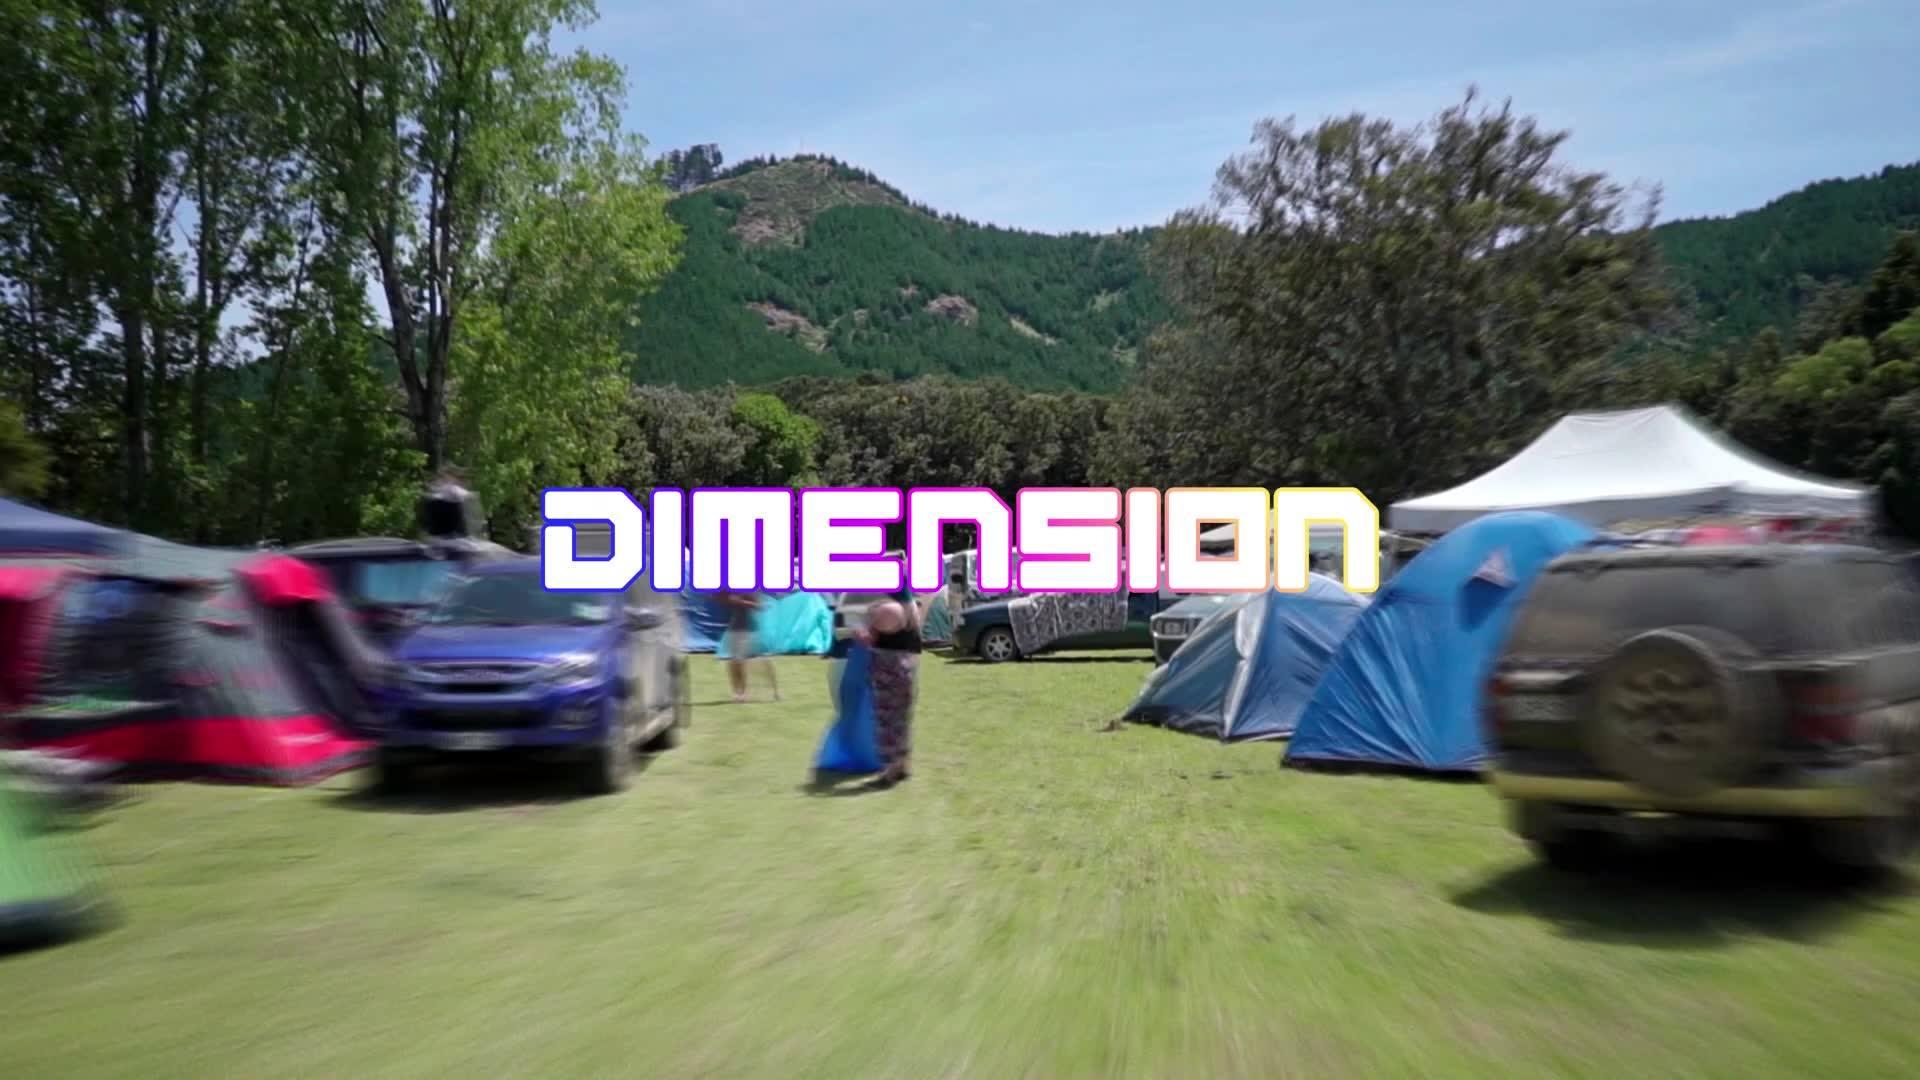 Dimension Festival New Zealand 2022